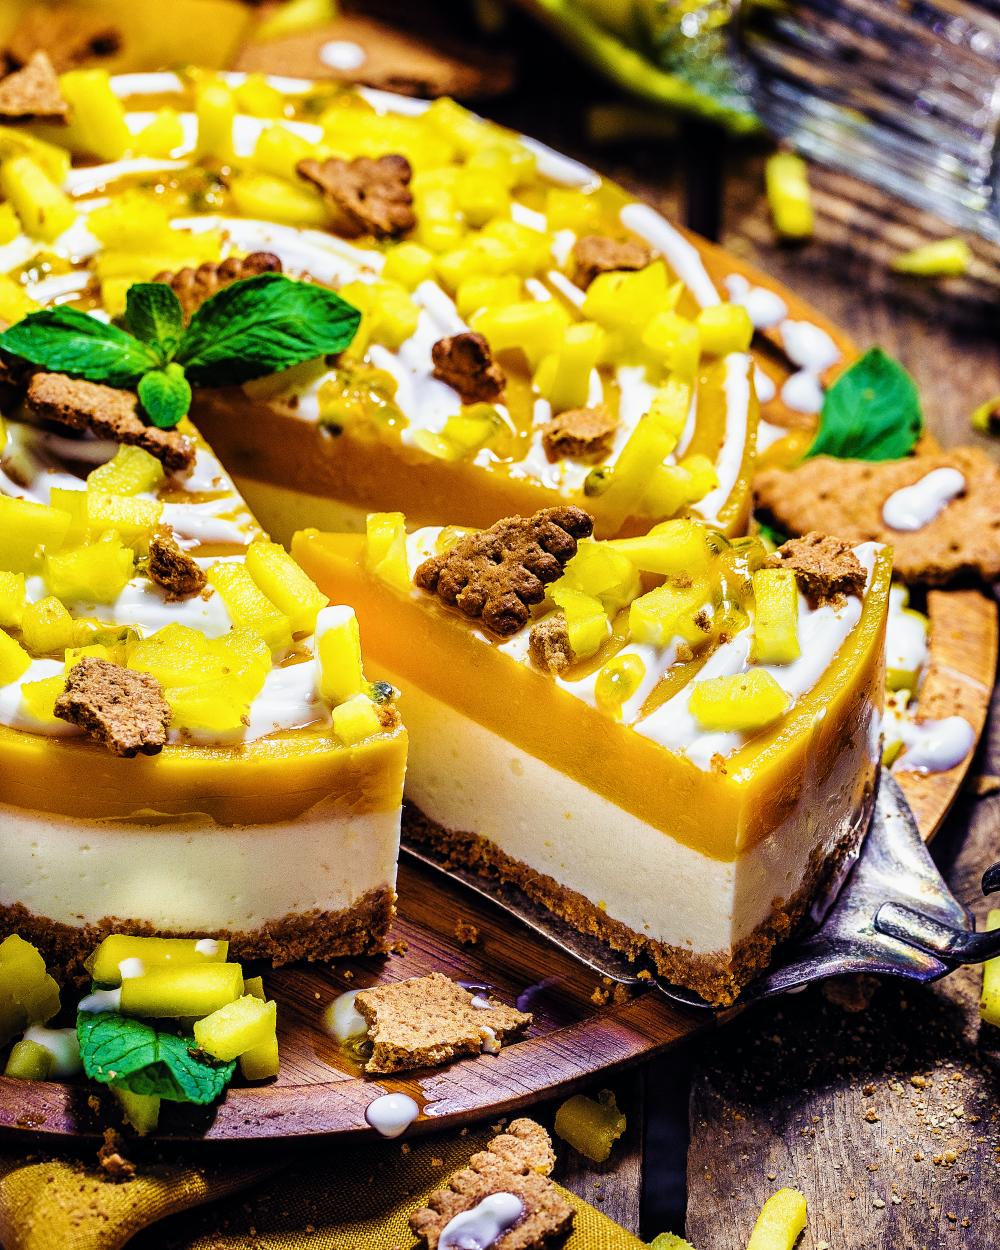 Mango-Maracuja-NoBake Cheesecake (2 Punkte pro Stück)